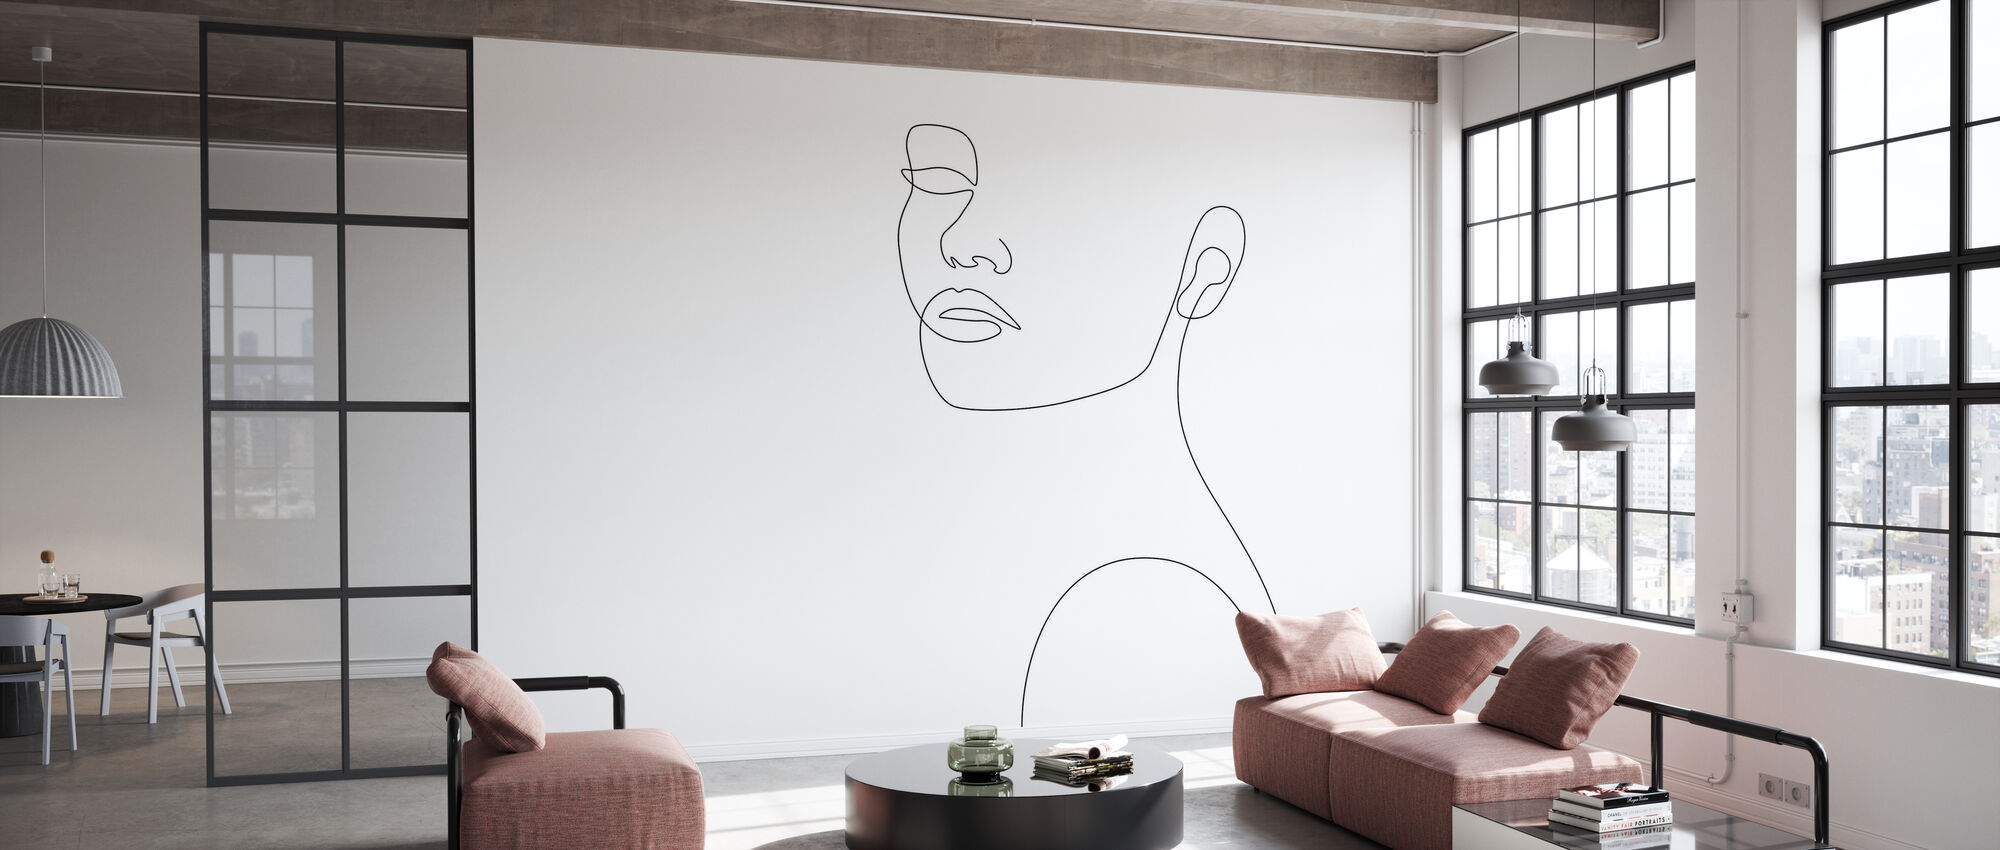 Girly Portrait - Wallpaper - Office